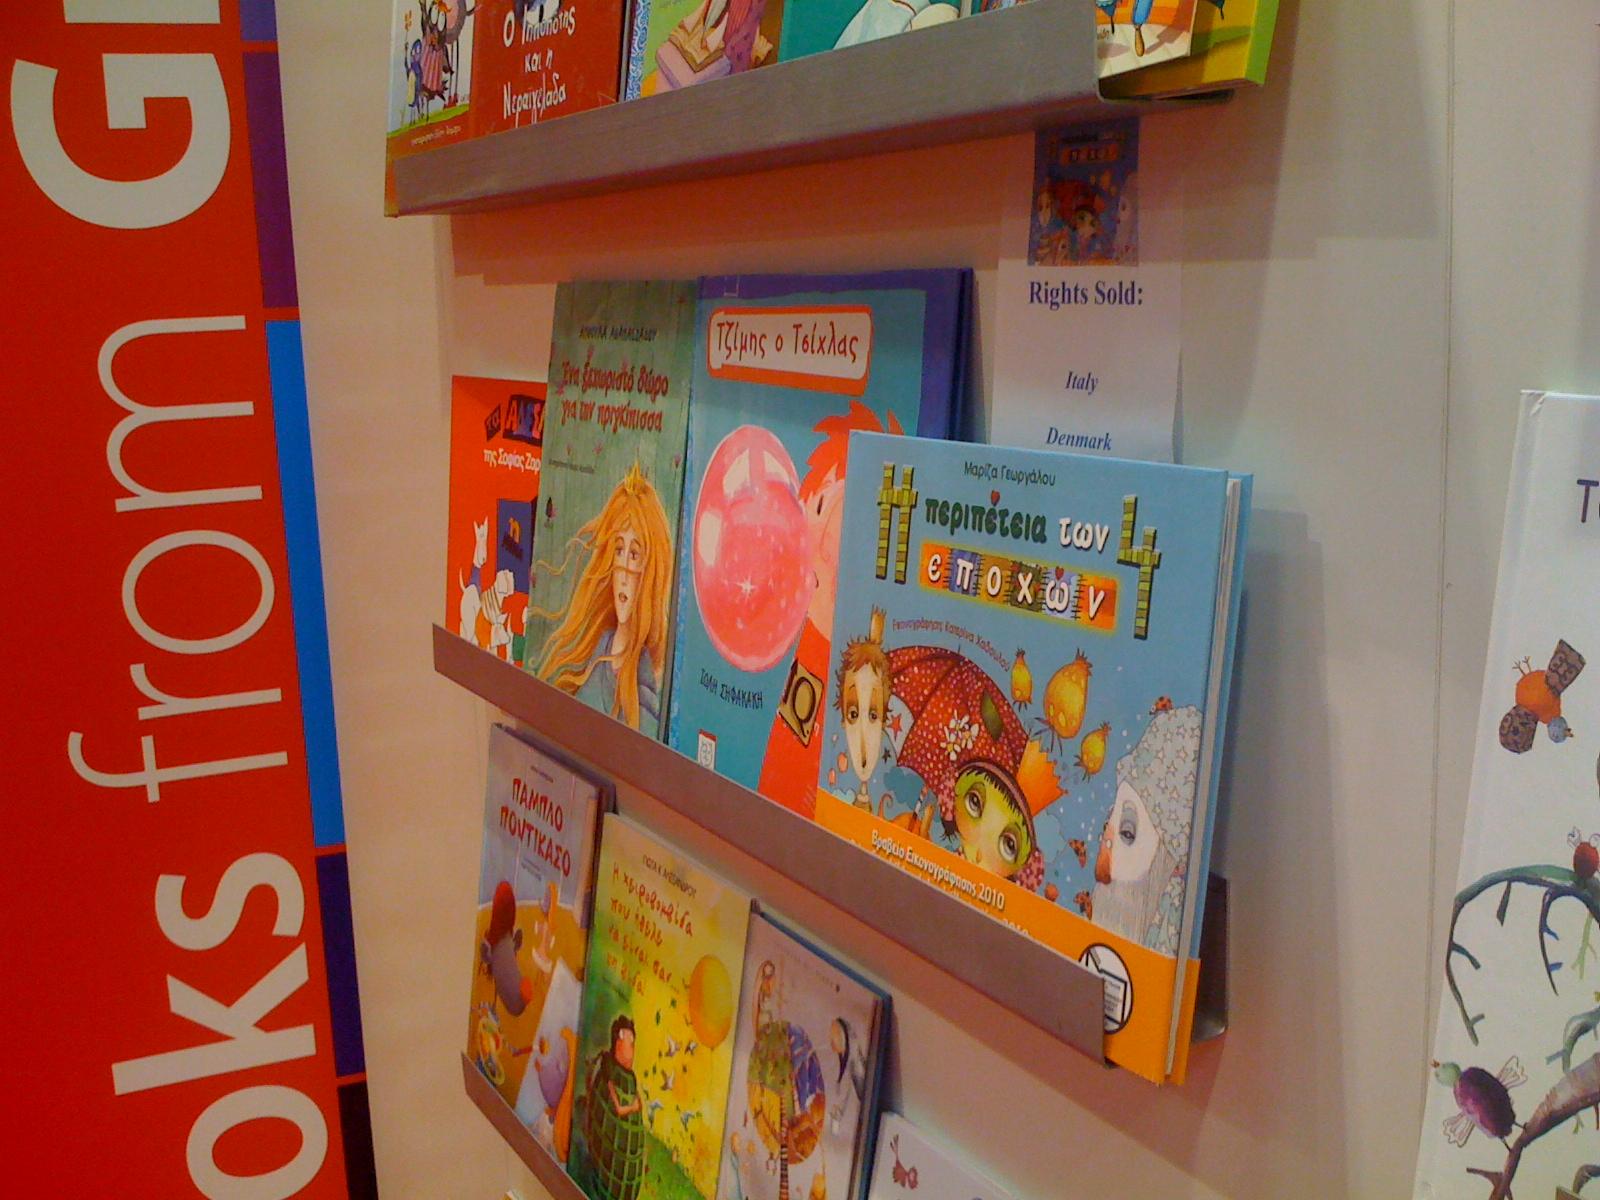 Bologna Children's Book Fair, 2011